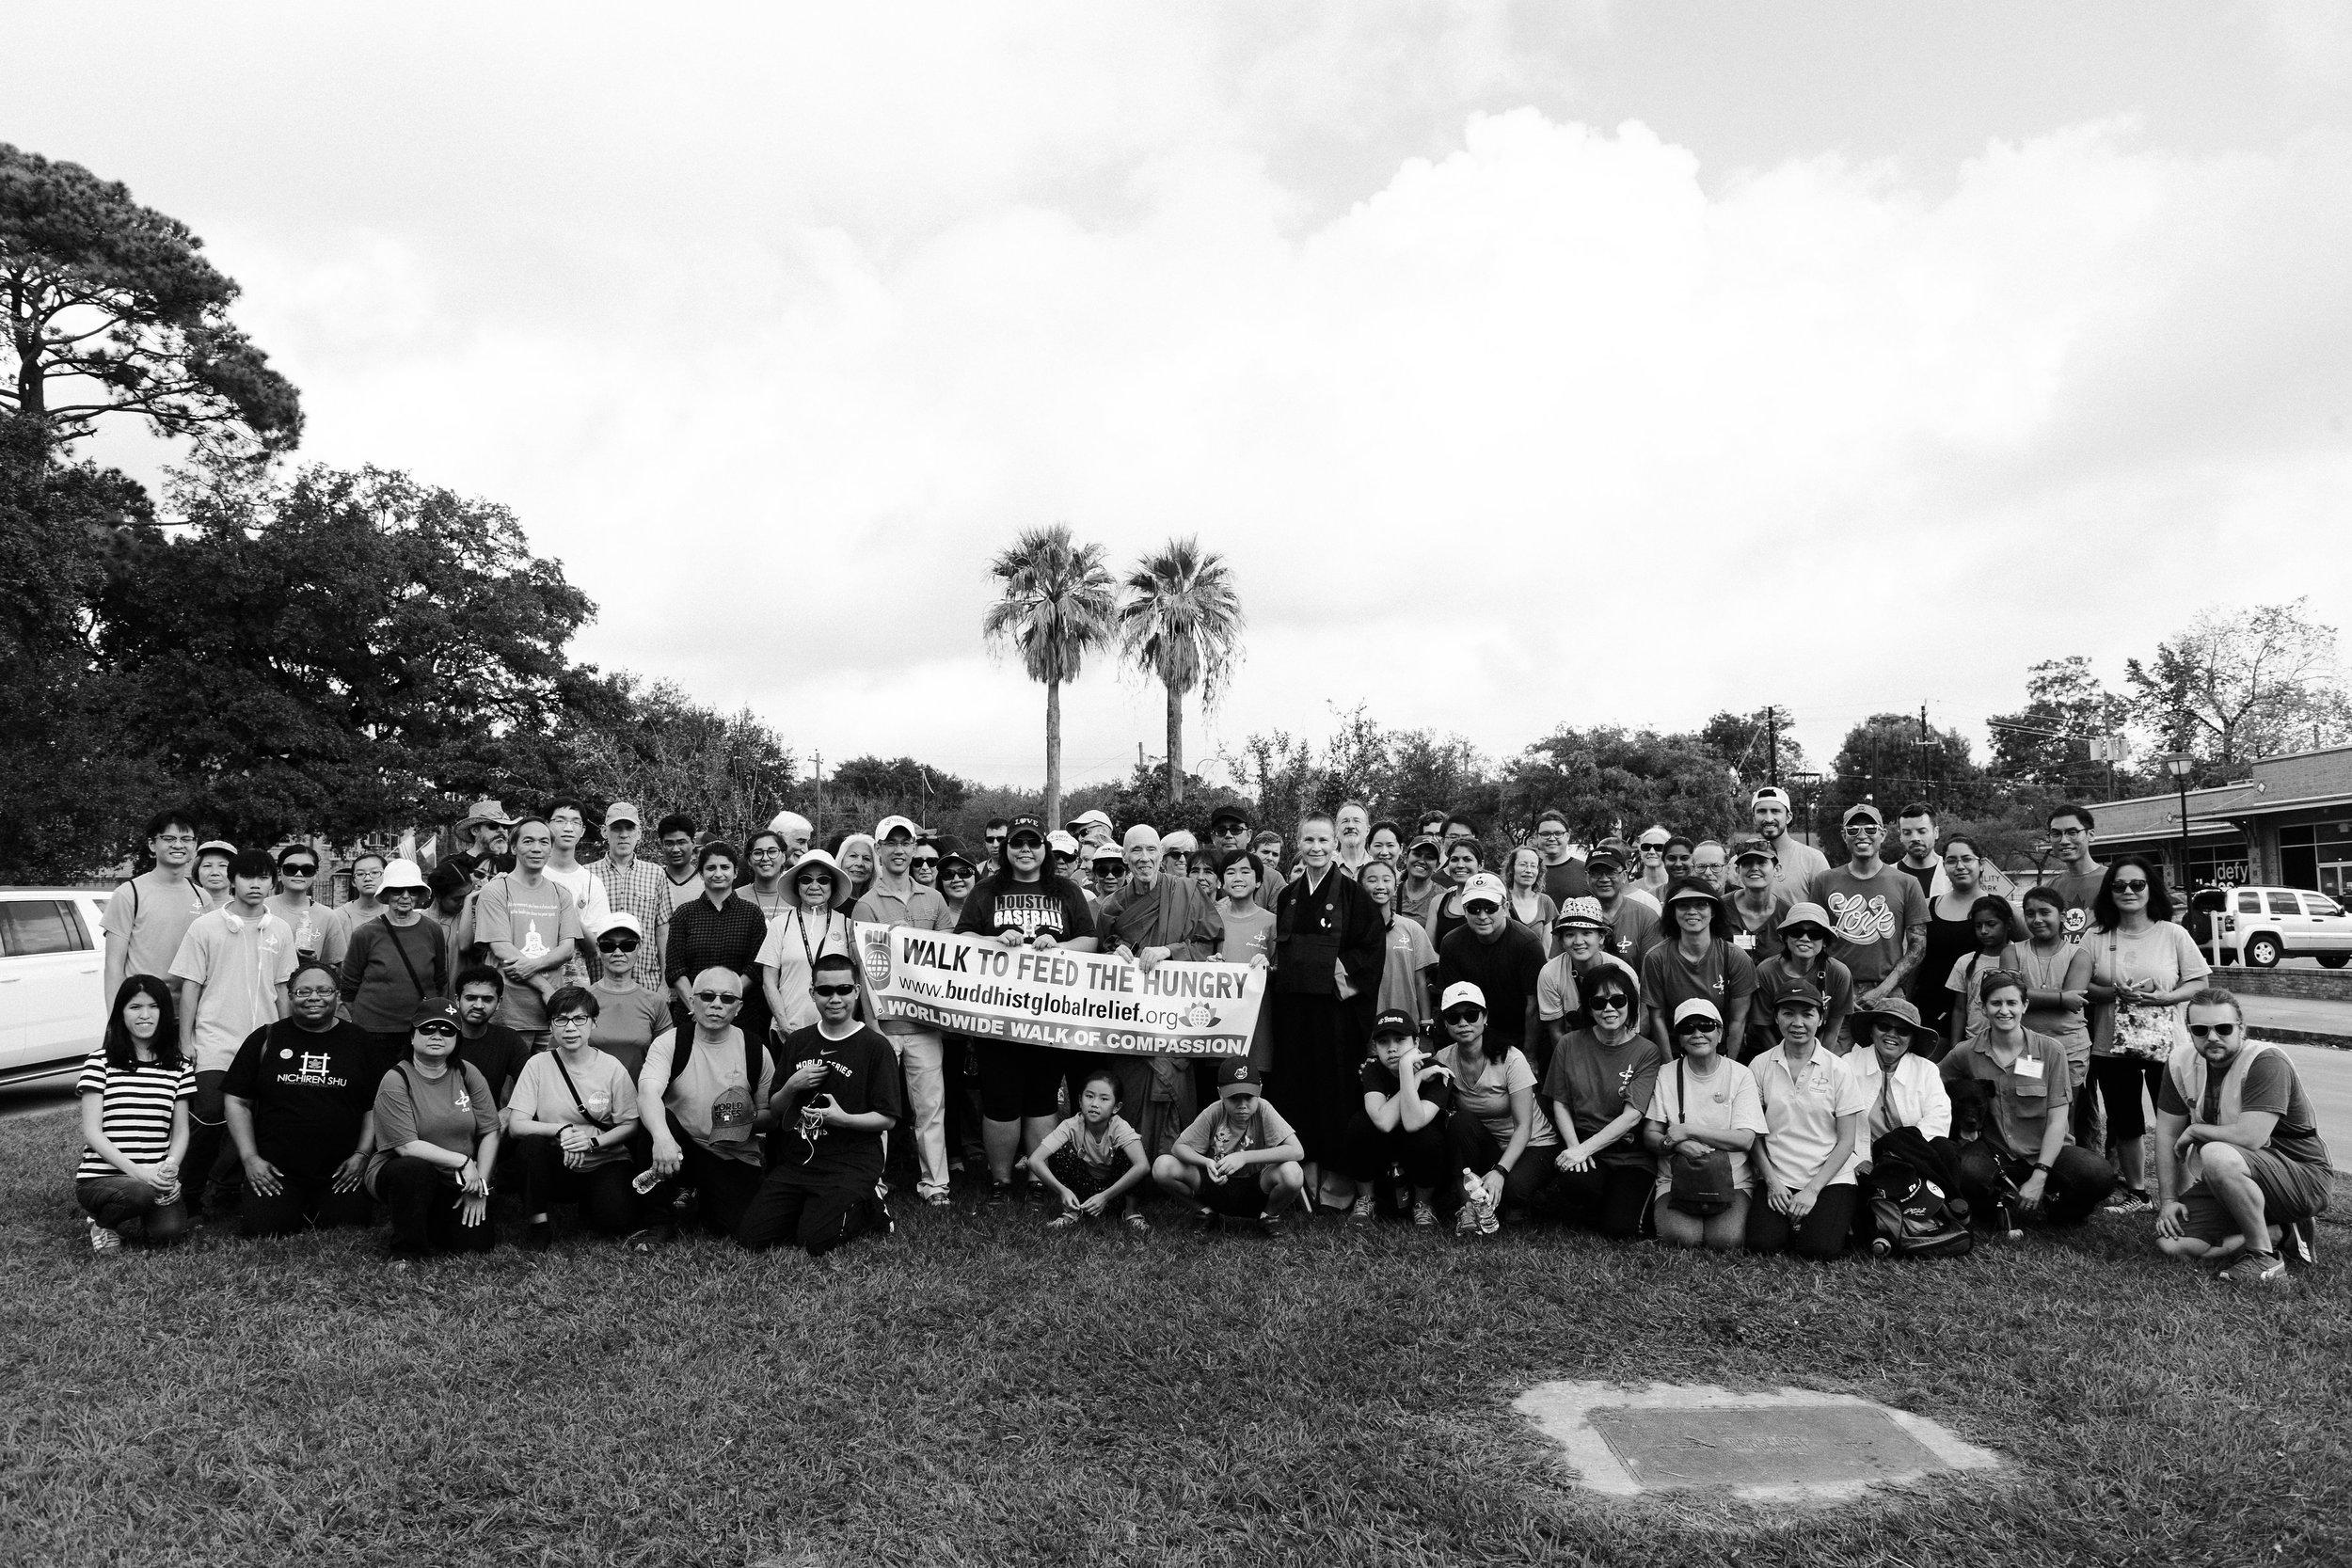 Bhikkhu-Bodhi-Global-Relief-Houston-Zen-Walk-71.jpg